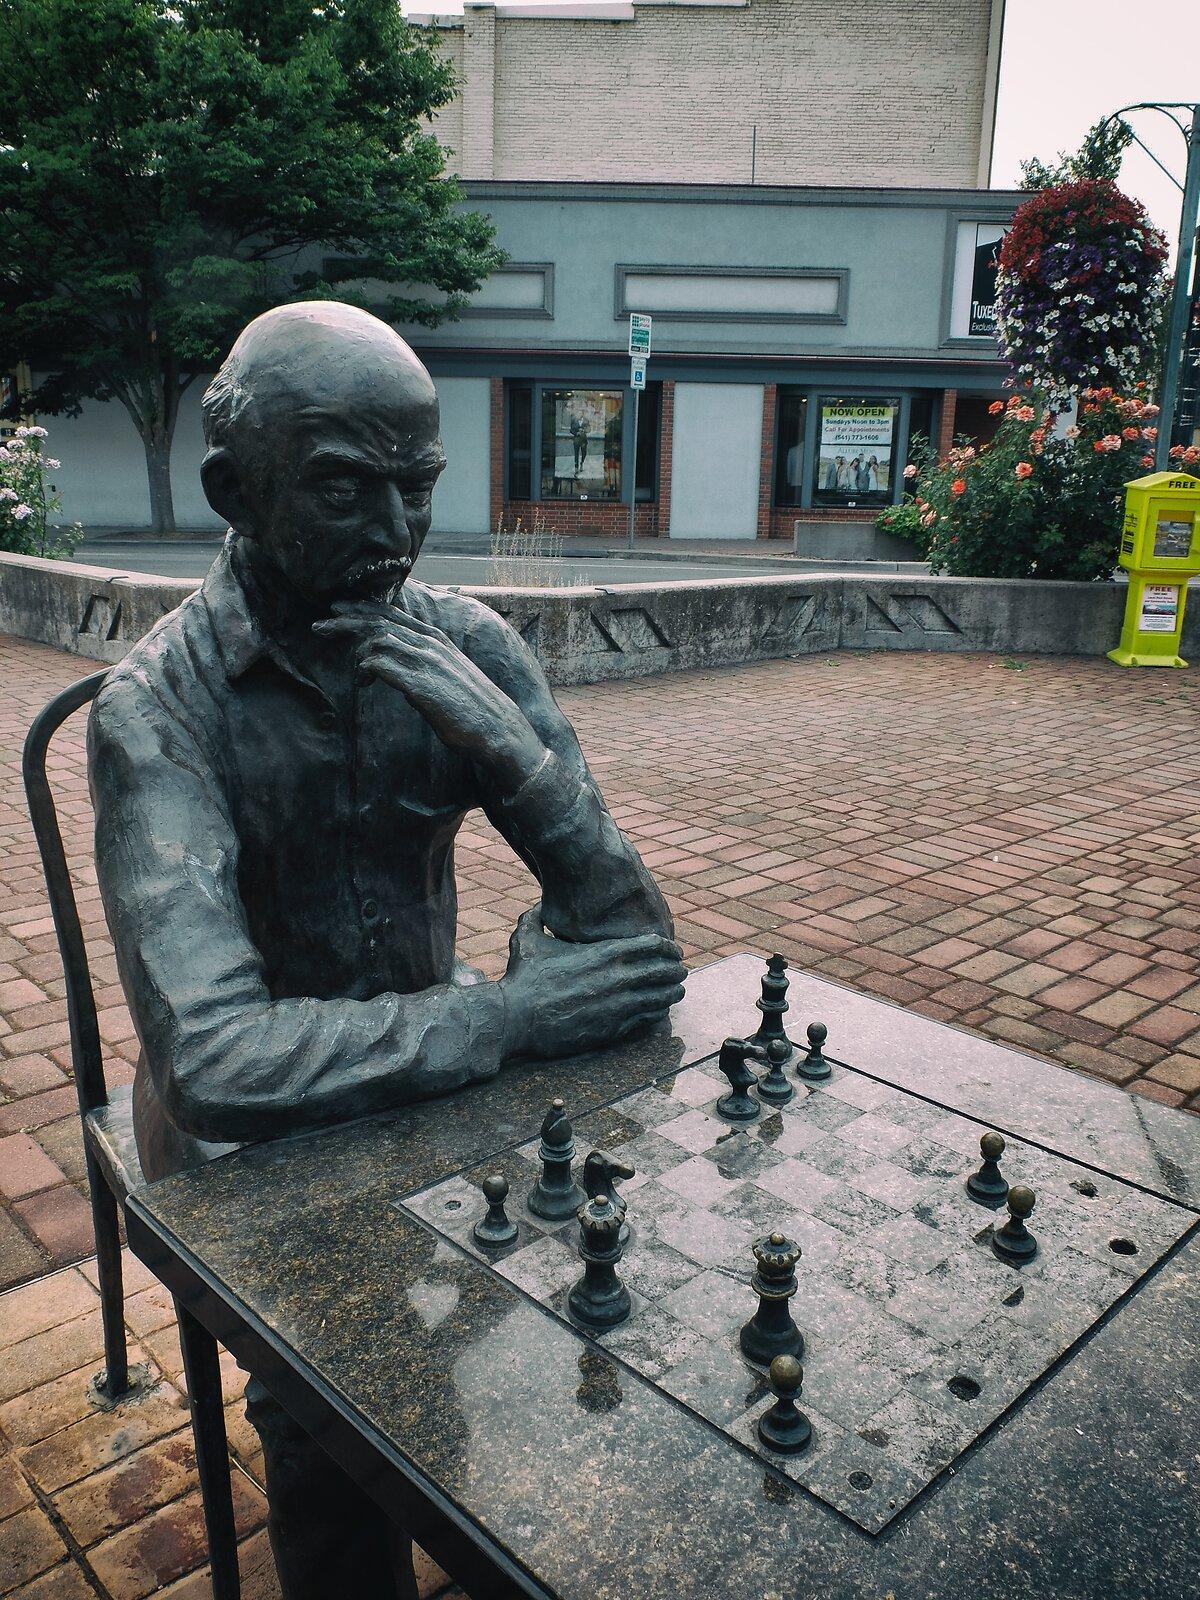 X30_July27_Chess_Player#2(AnalEfex).jpg